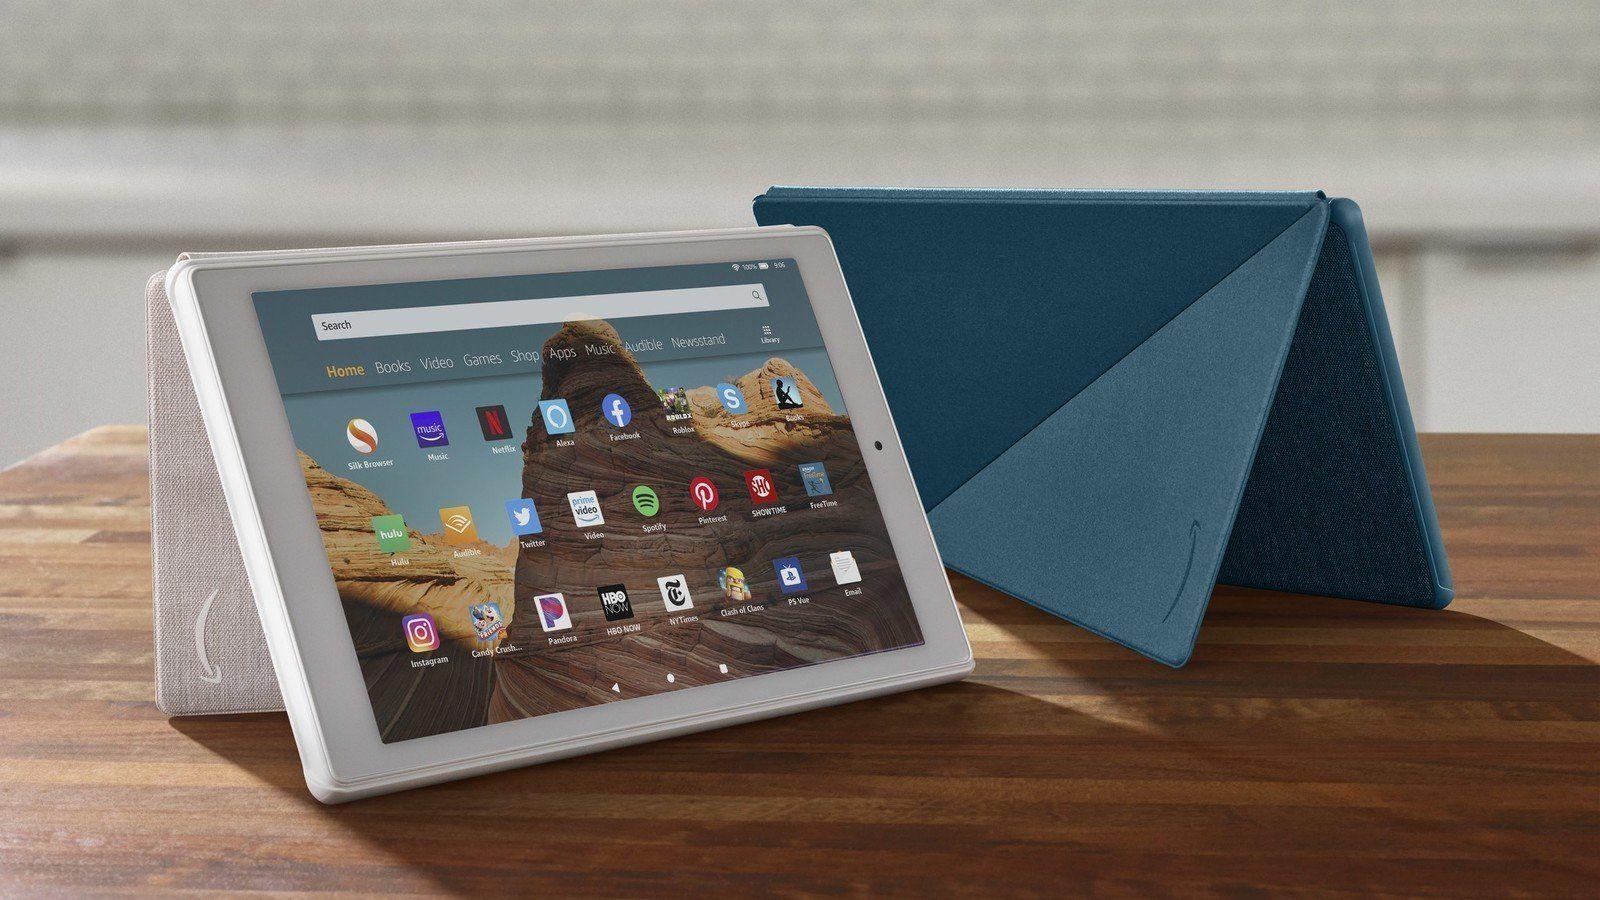 Best Amazon Fire Tablet 2020 En 2020 Dell Xps Computadoras Computadora Portatil